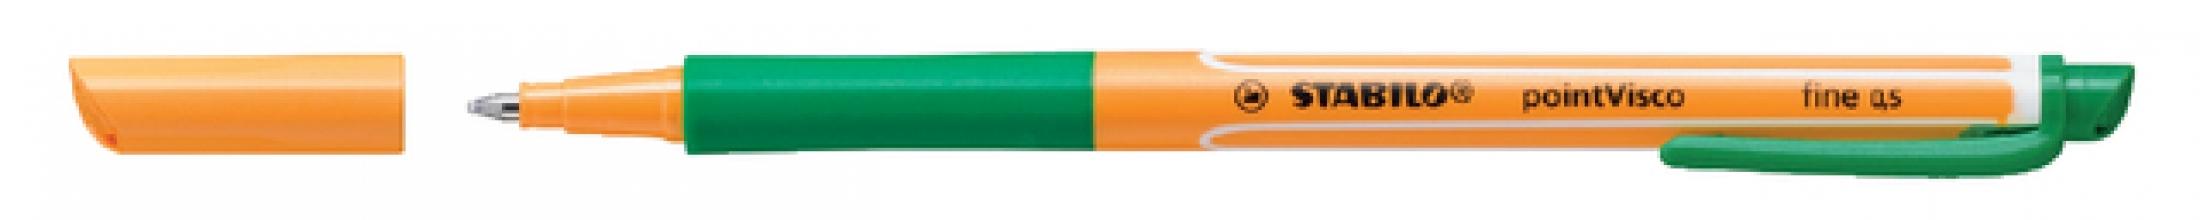 , Rollerpen STABILO PointVisco 1099/36 groen